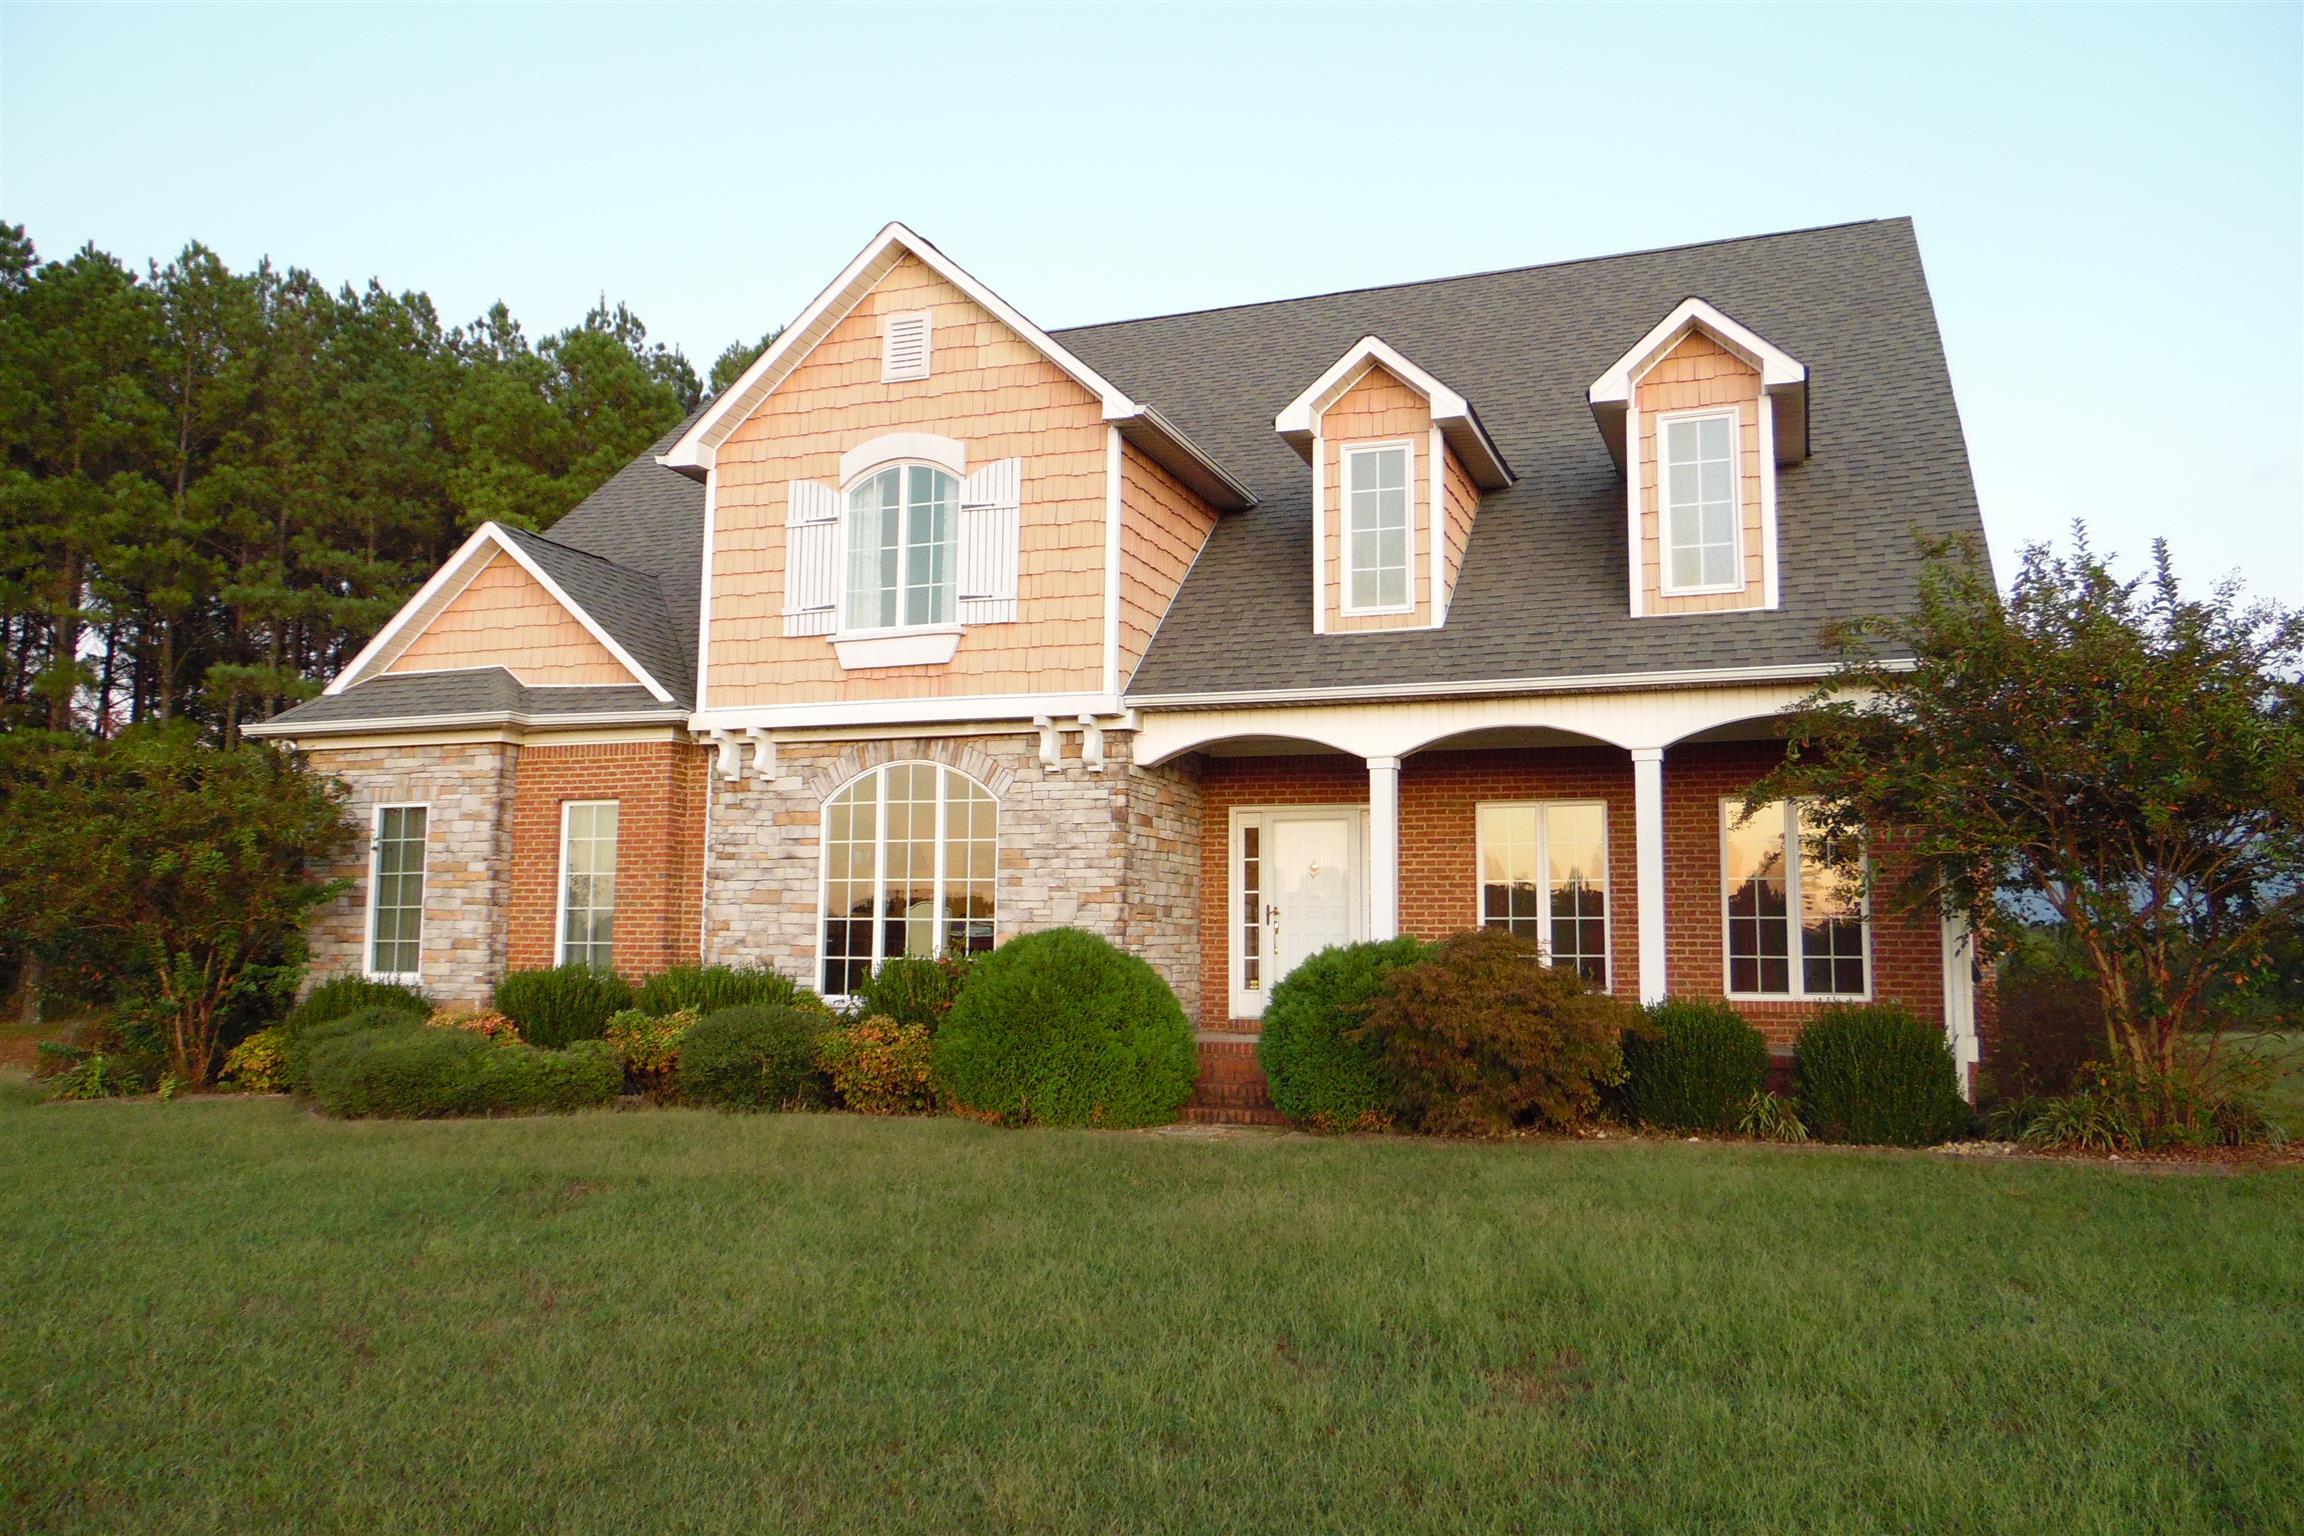 828 Prosser Rd, Leoma, TN 38468 - Leoma, TN real estate listing